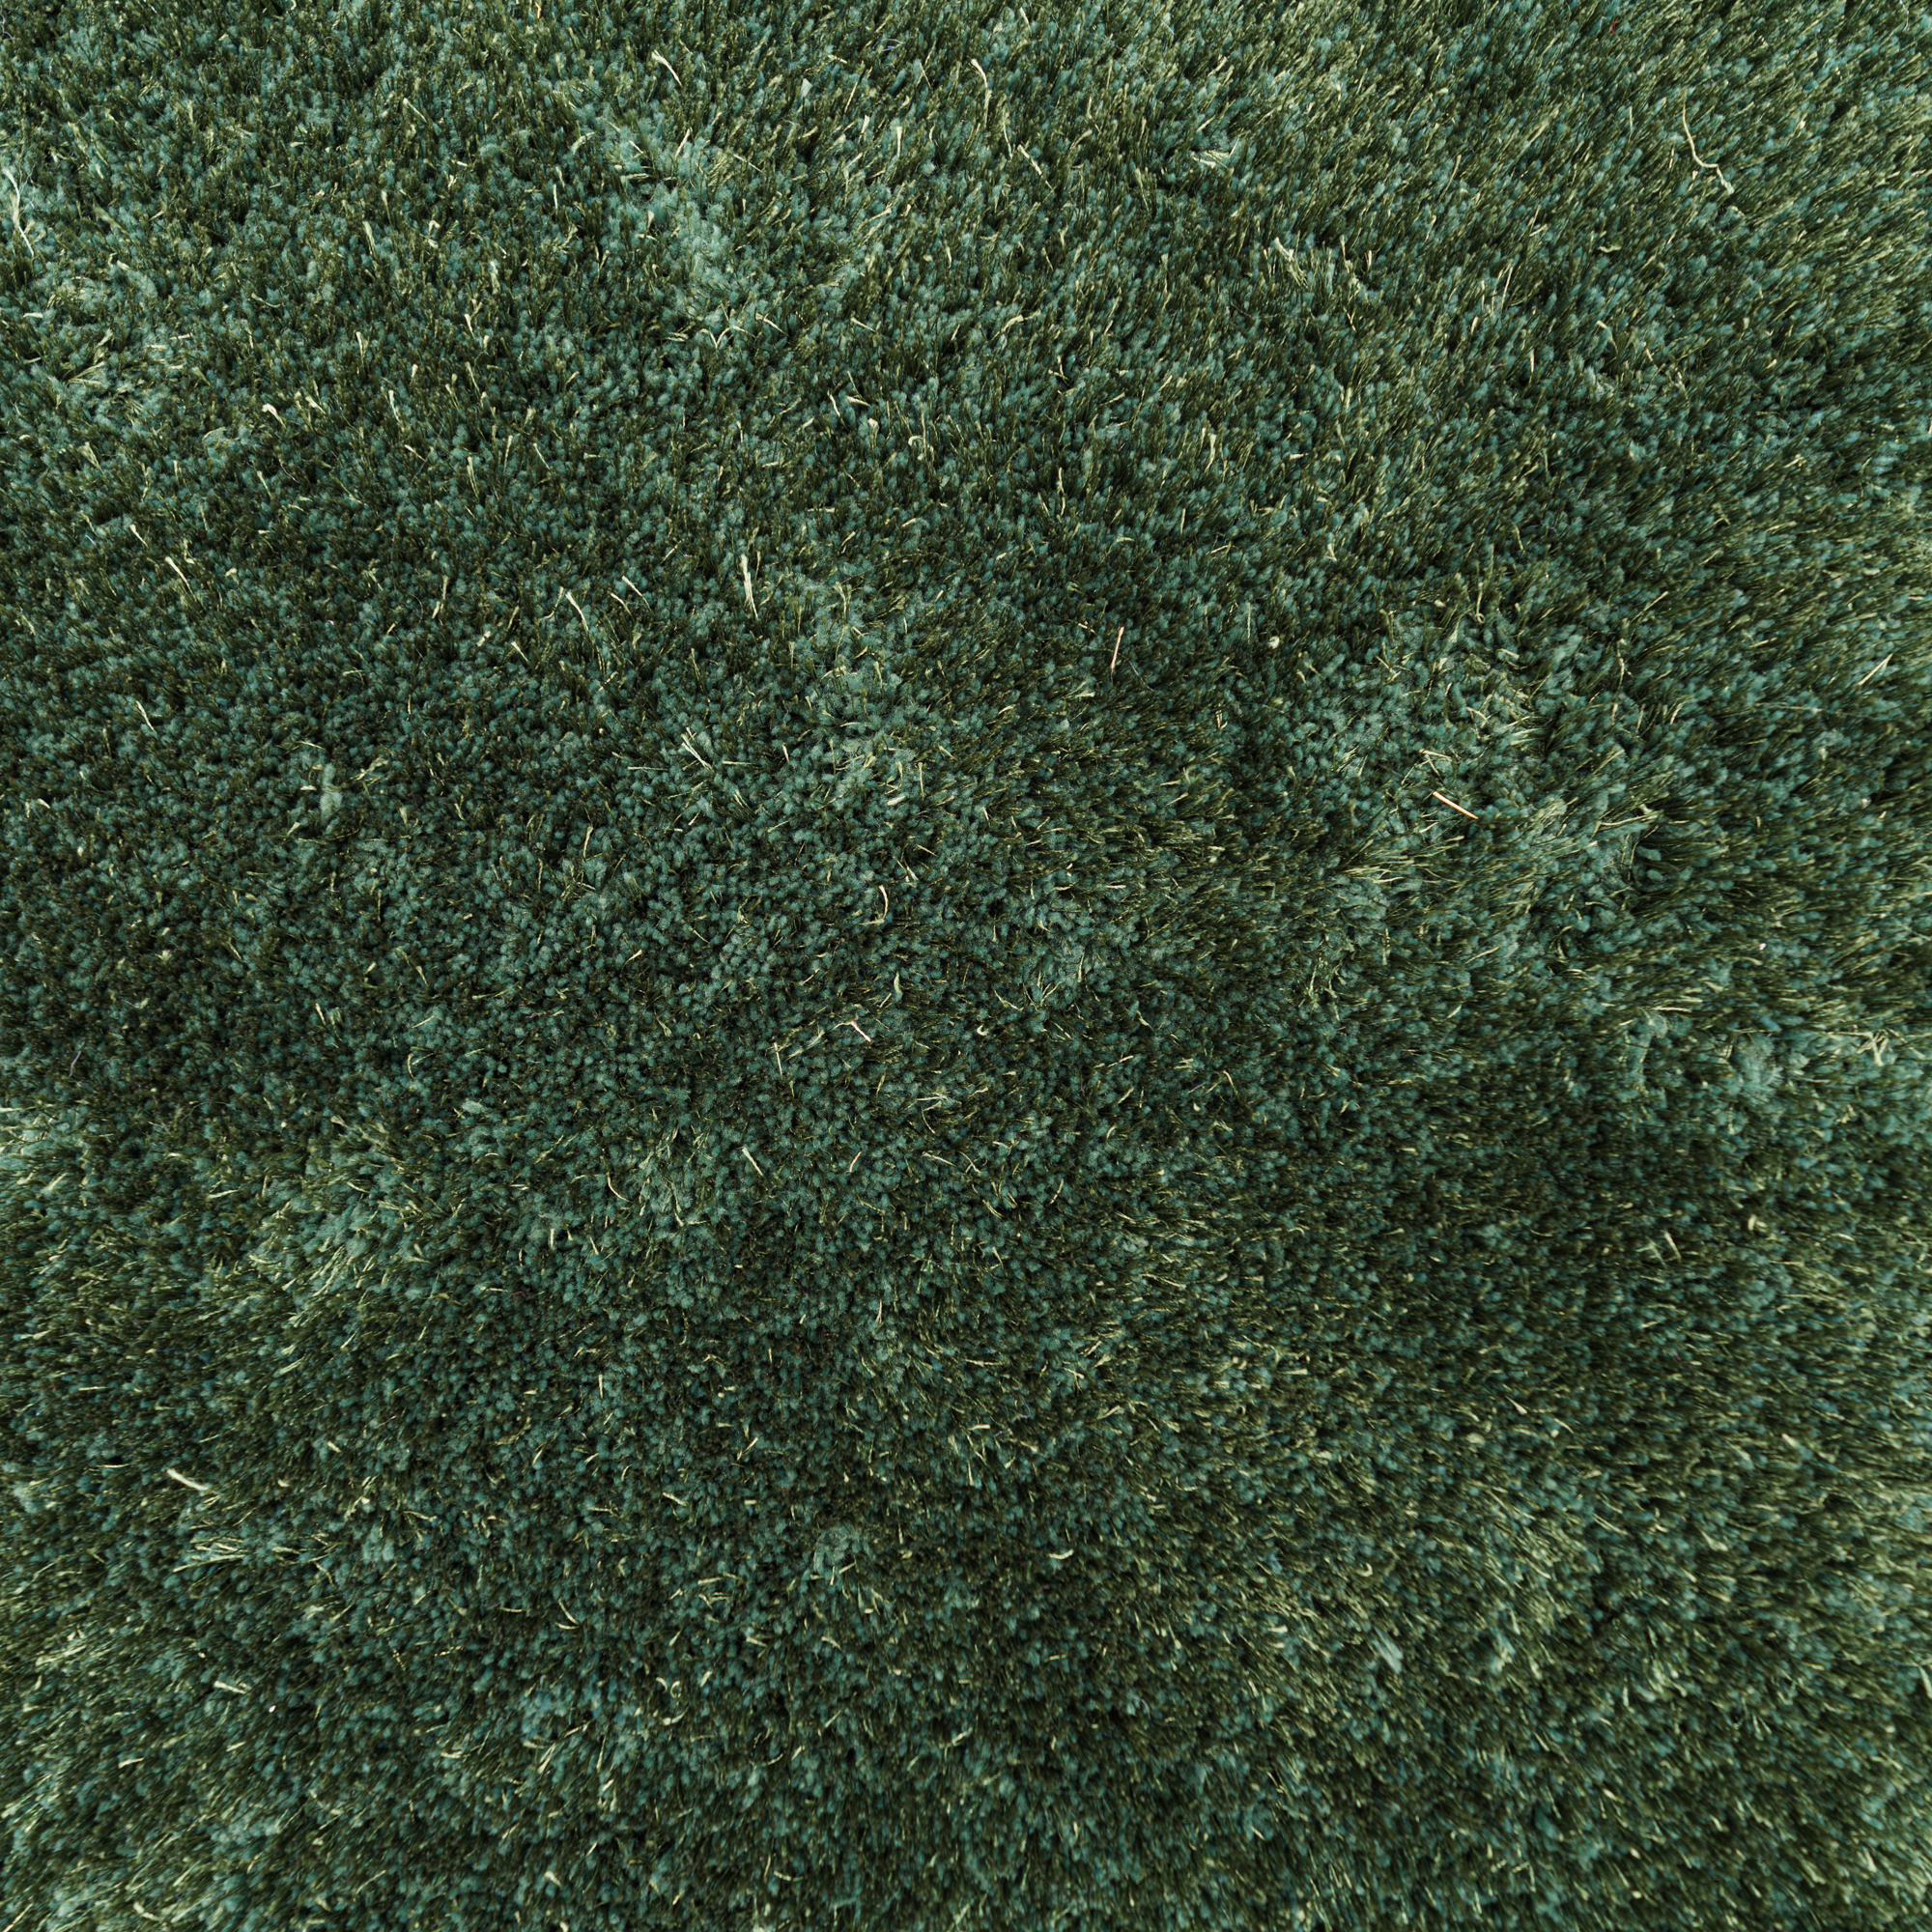 Vloerkleed Xilento Twinkle Mossgreen | 200 x 300 cm